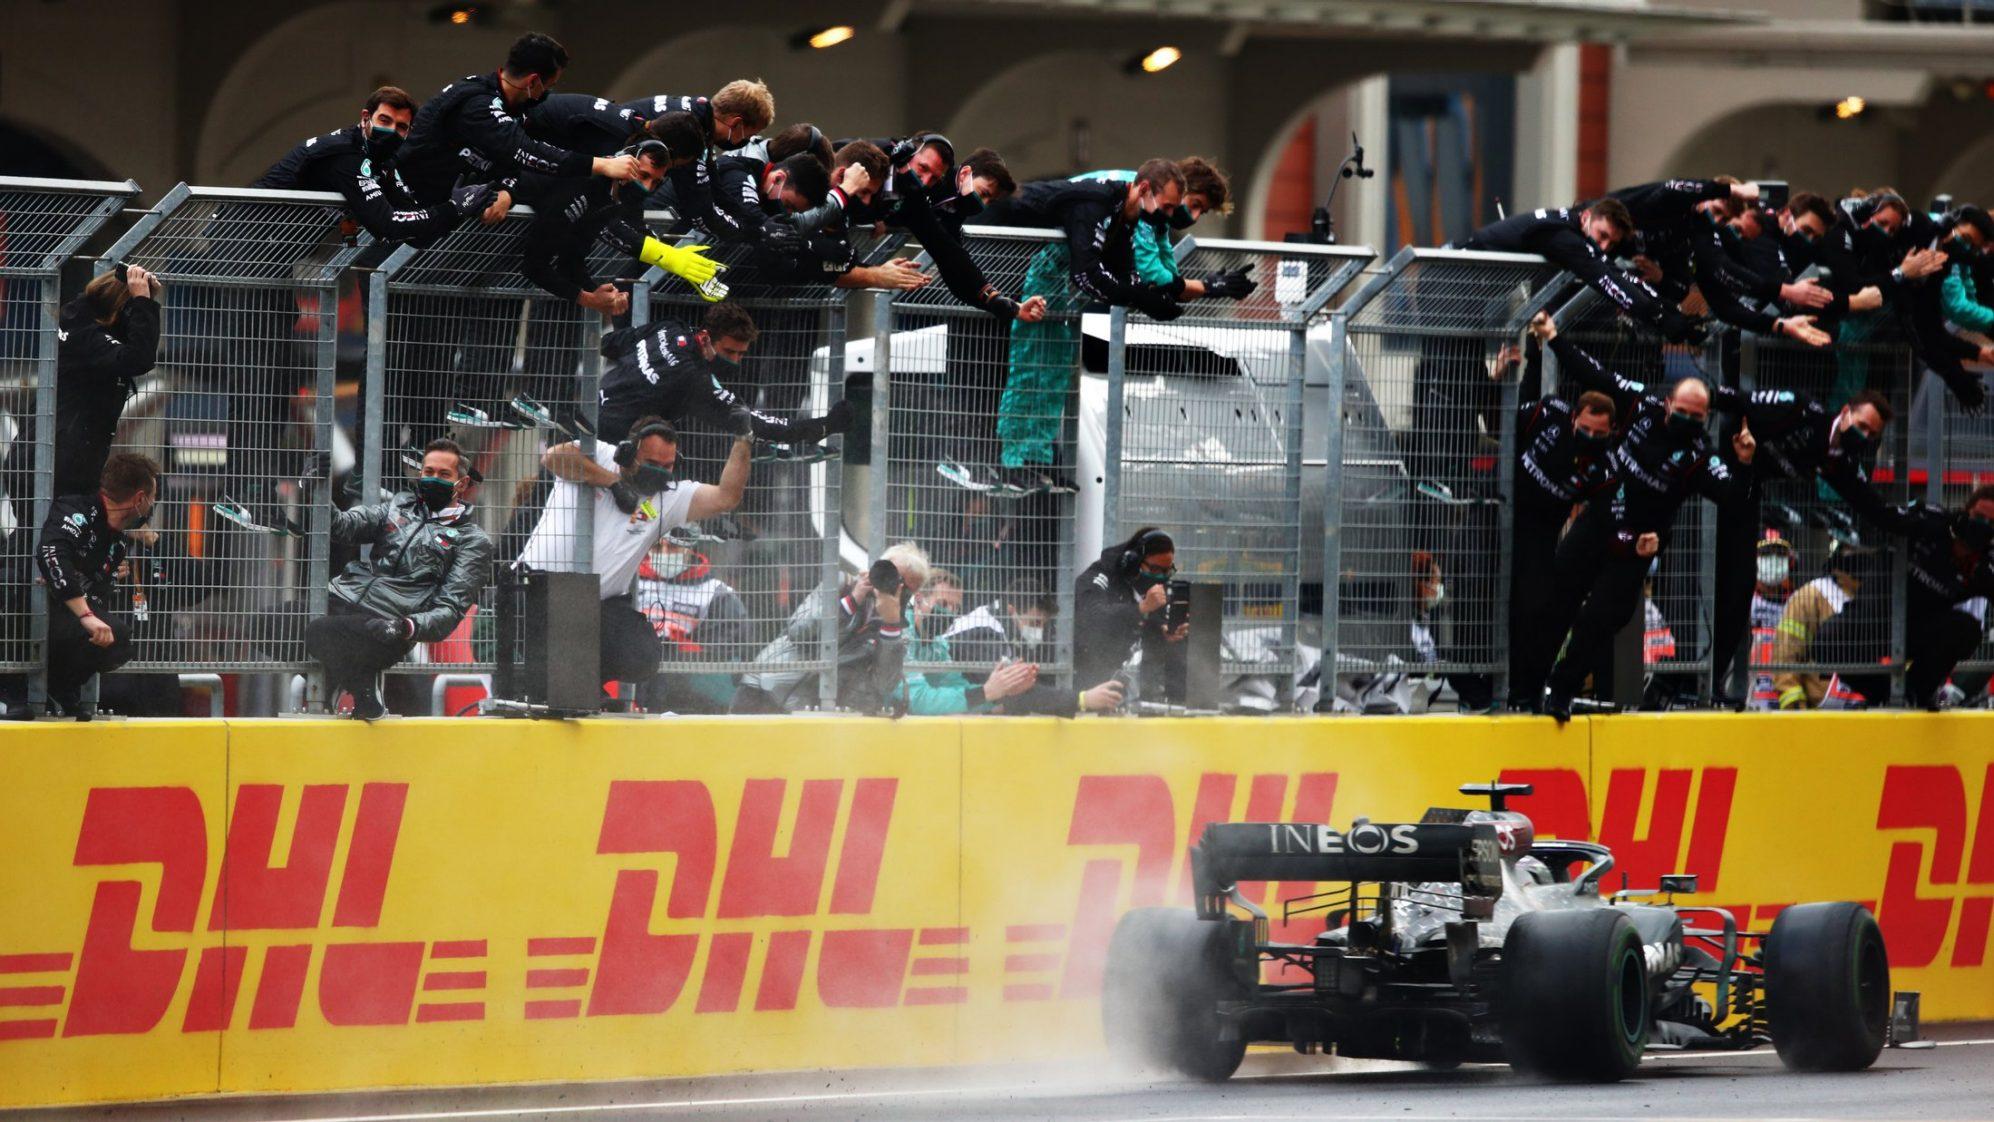 Формула-1: Хэмилтон повторил рекорд Шумахера